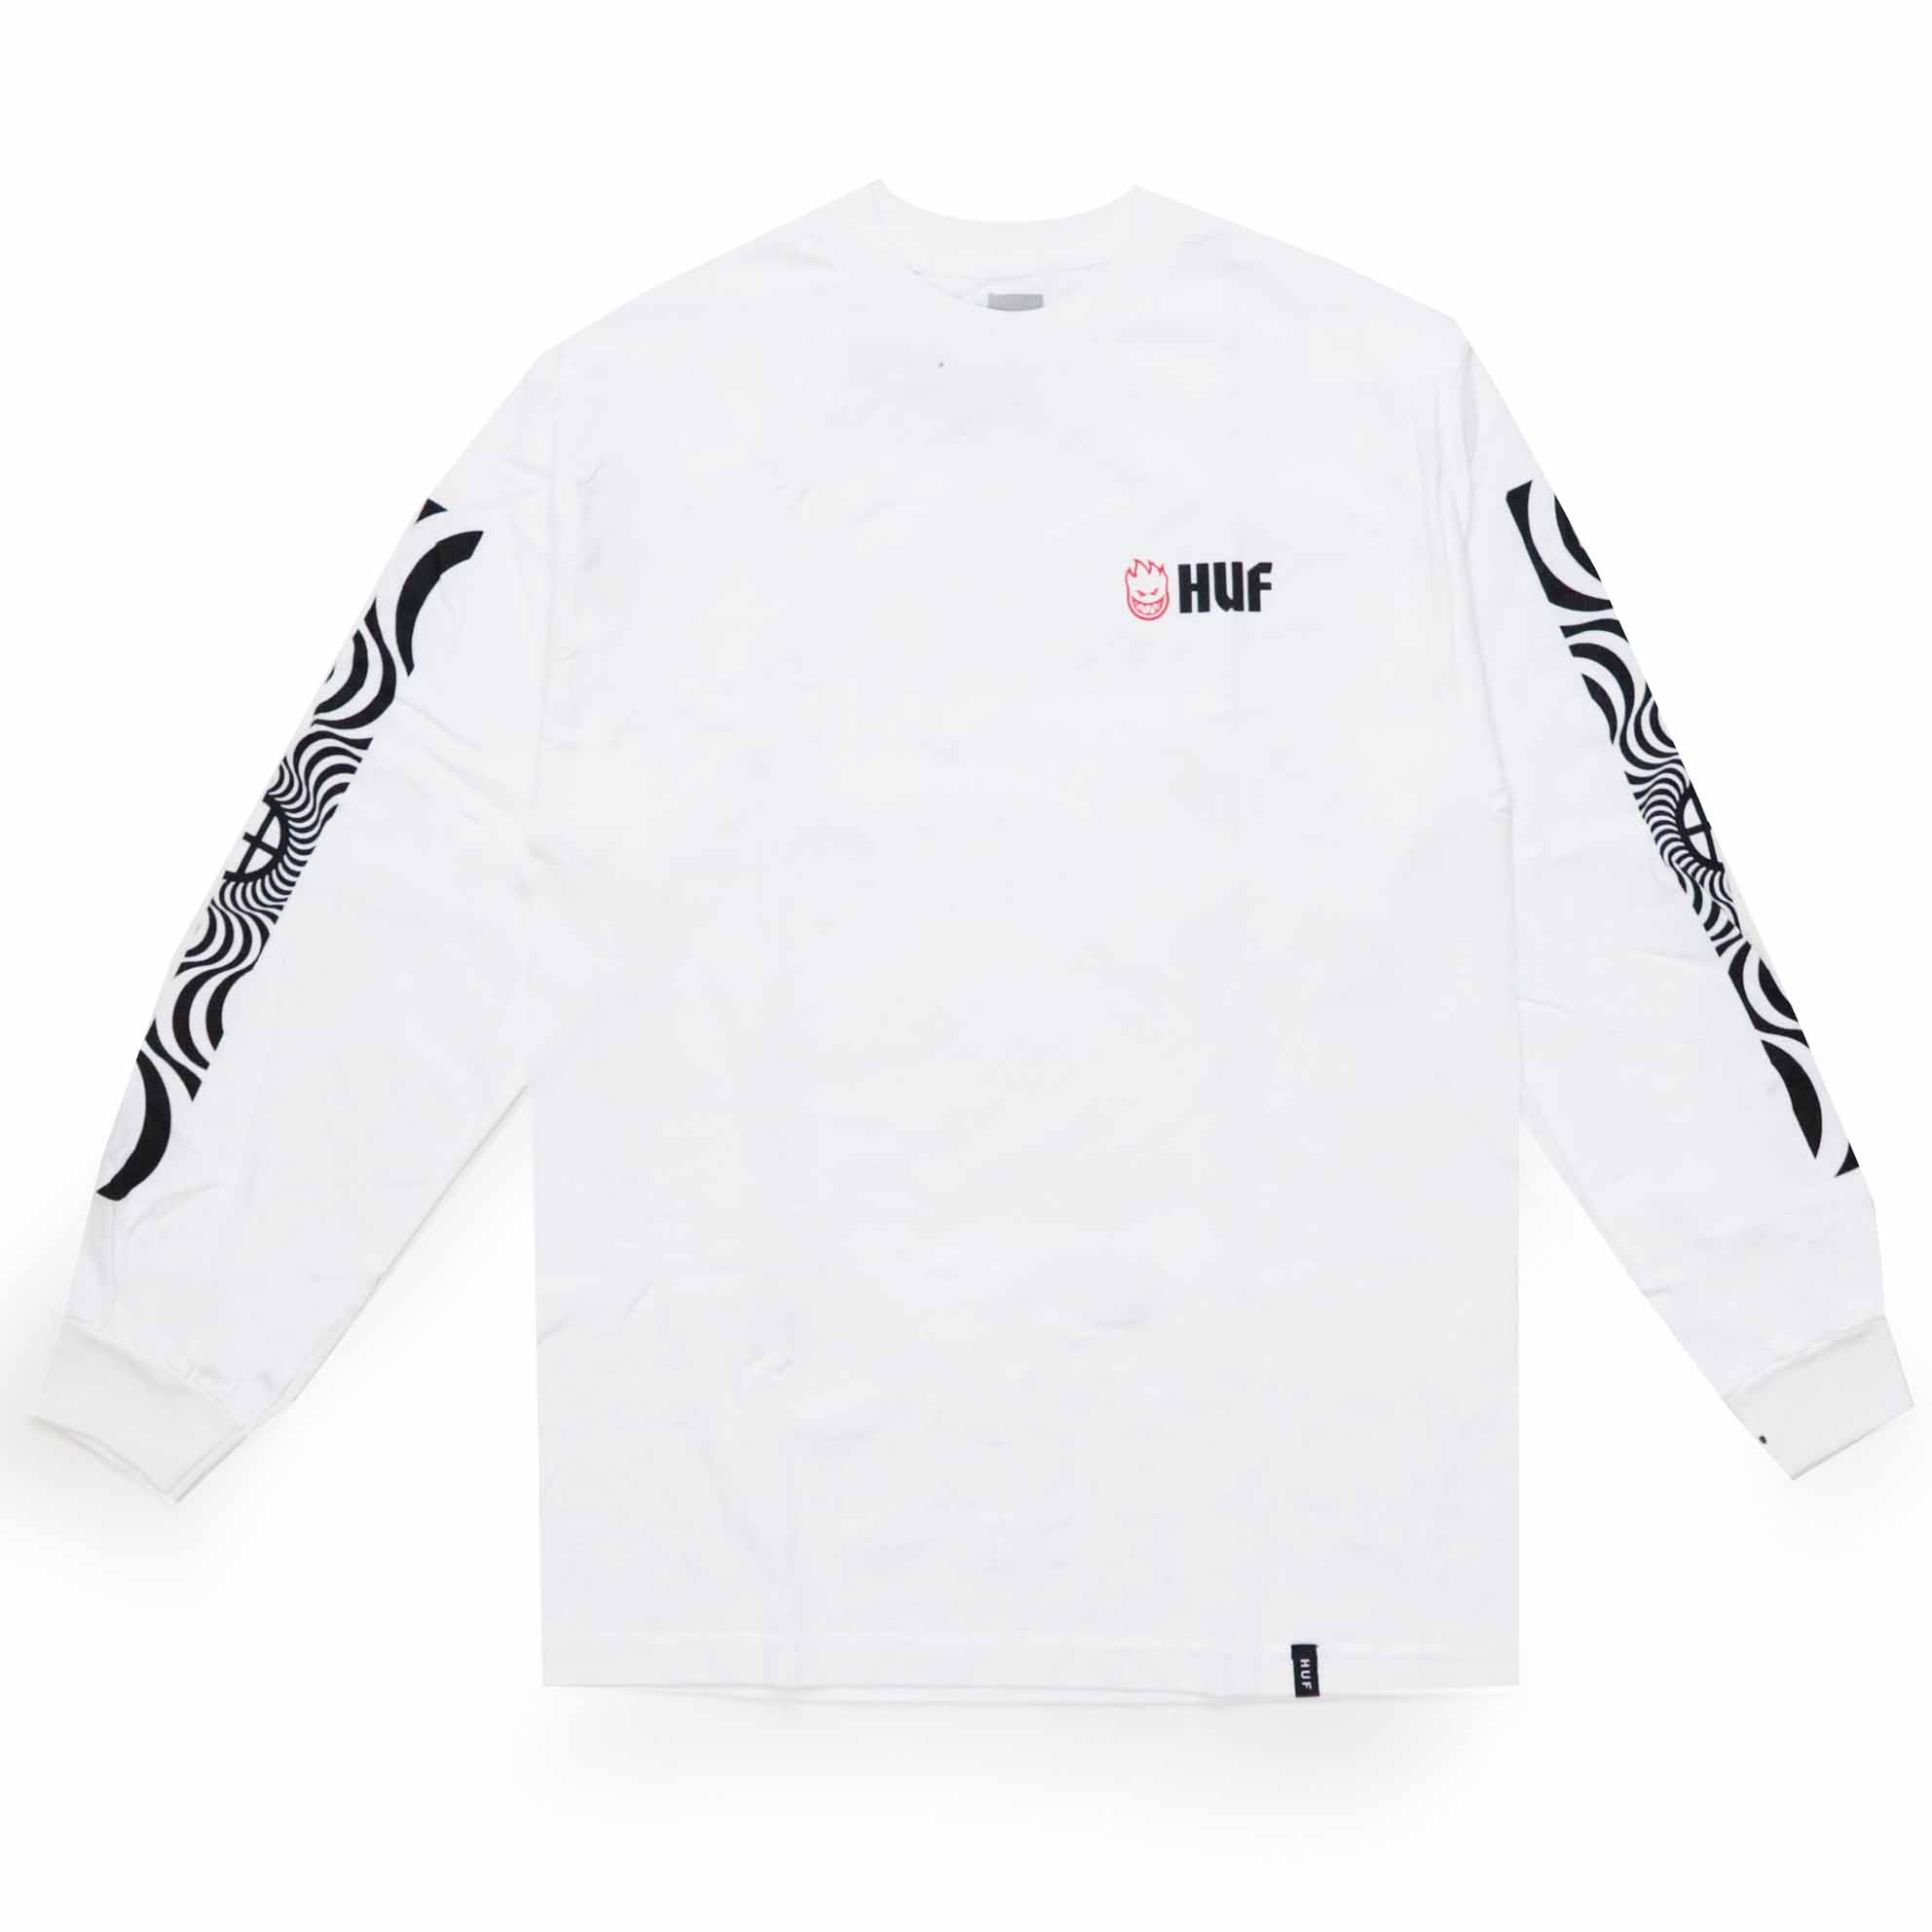 Camiseta Manga Longa HUF x Spitfire Swirls - Branco (Importado)